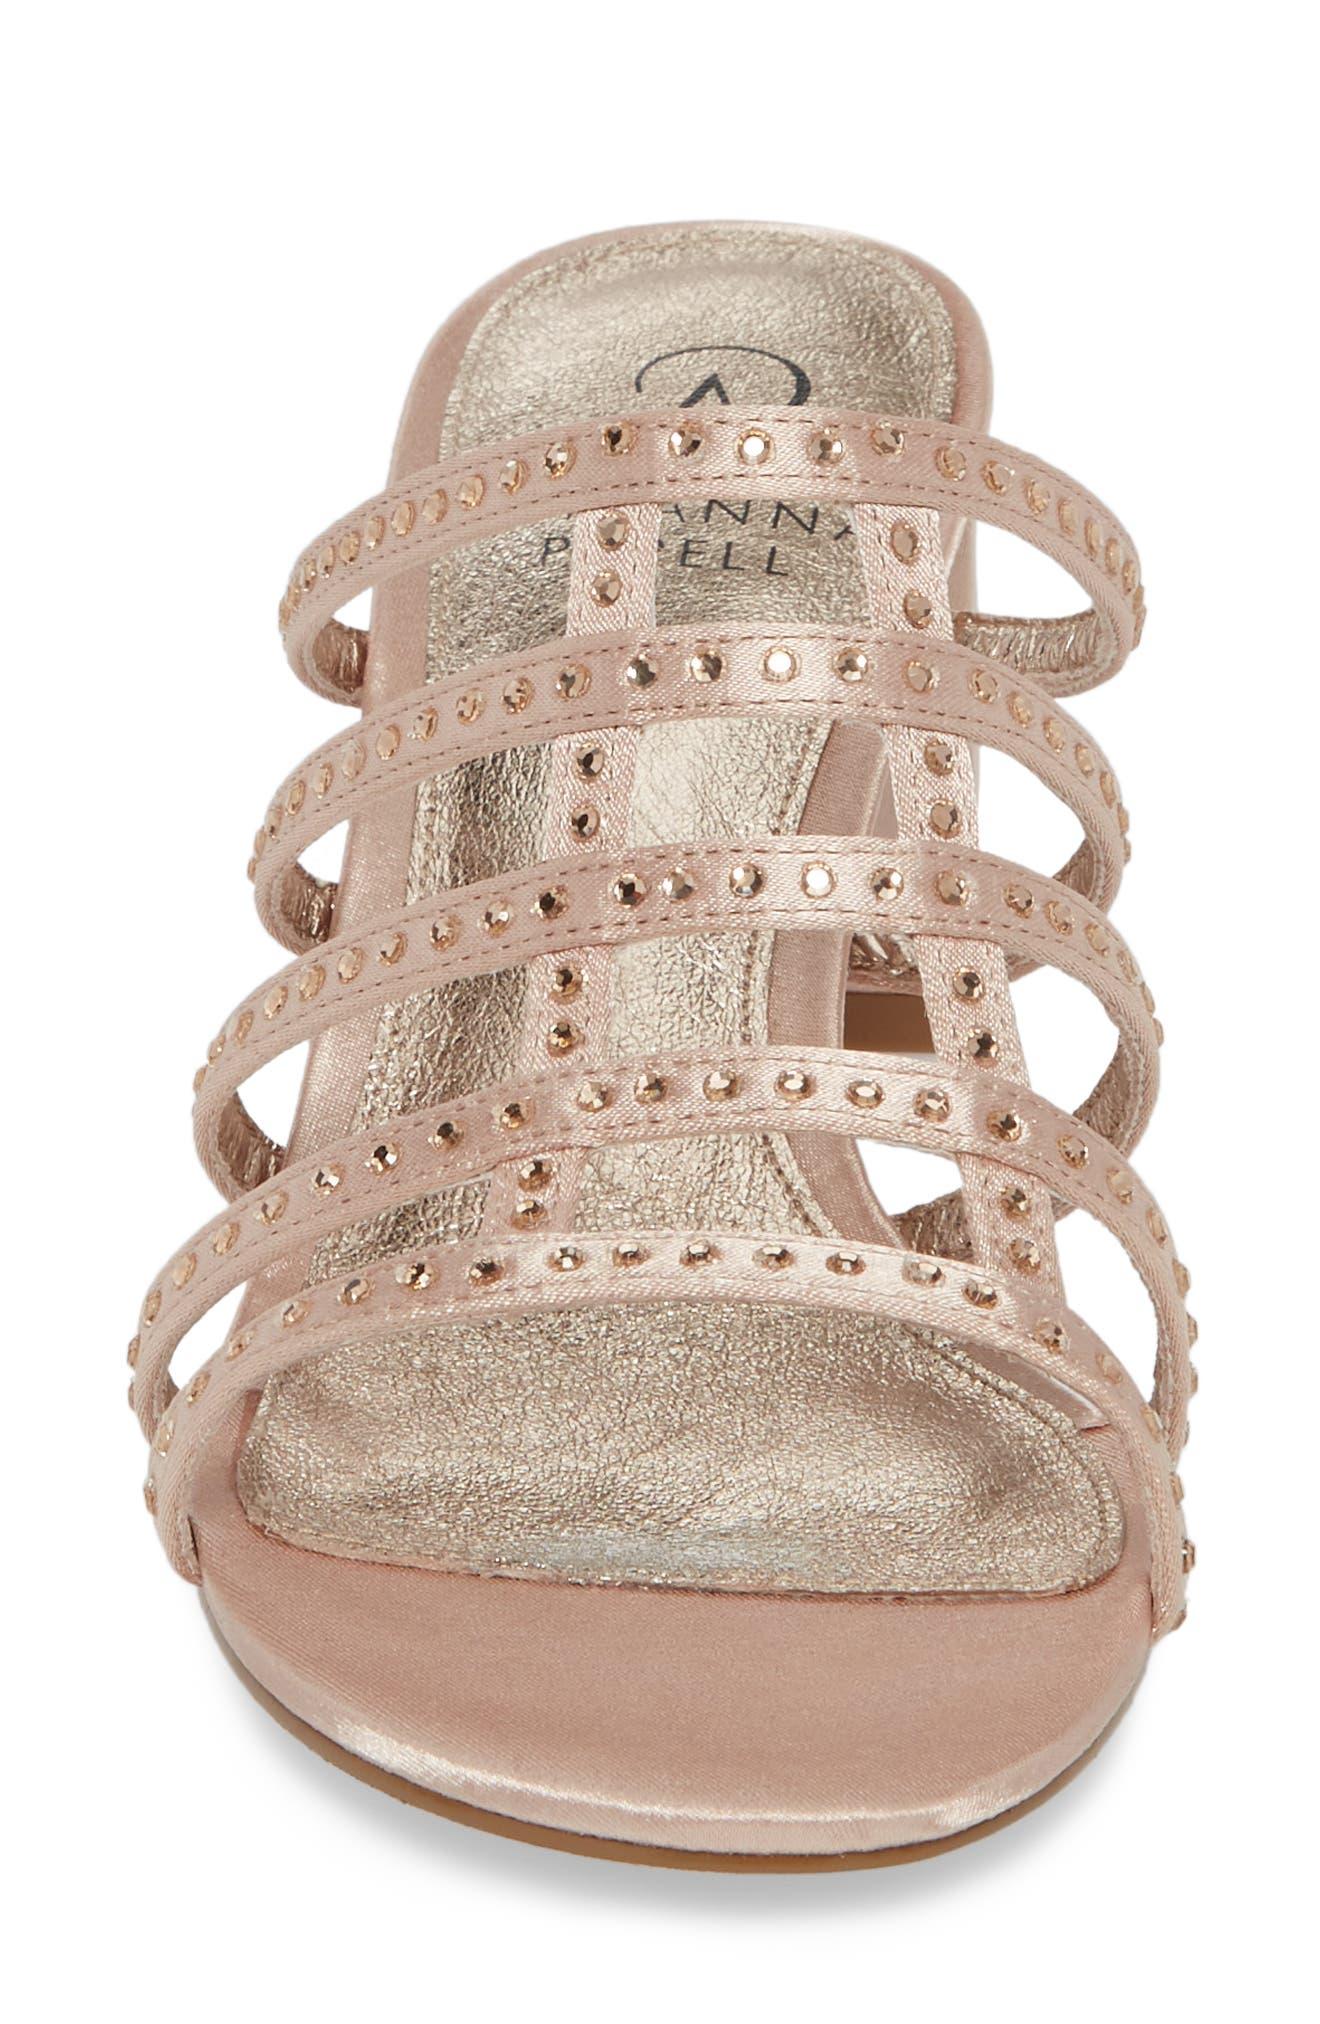 Apollo Block Heel Sandal,                             Alternate thumbnail 4, color,                             Sheer Fabric